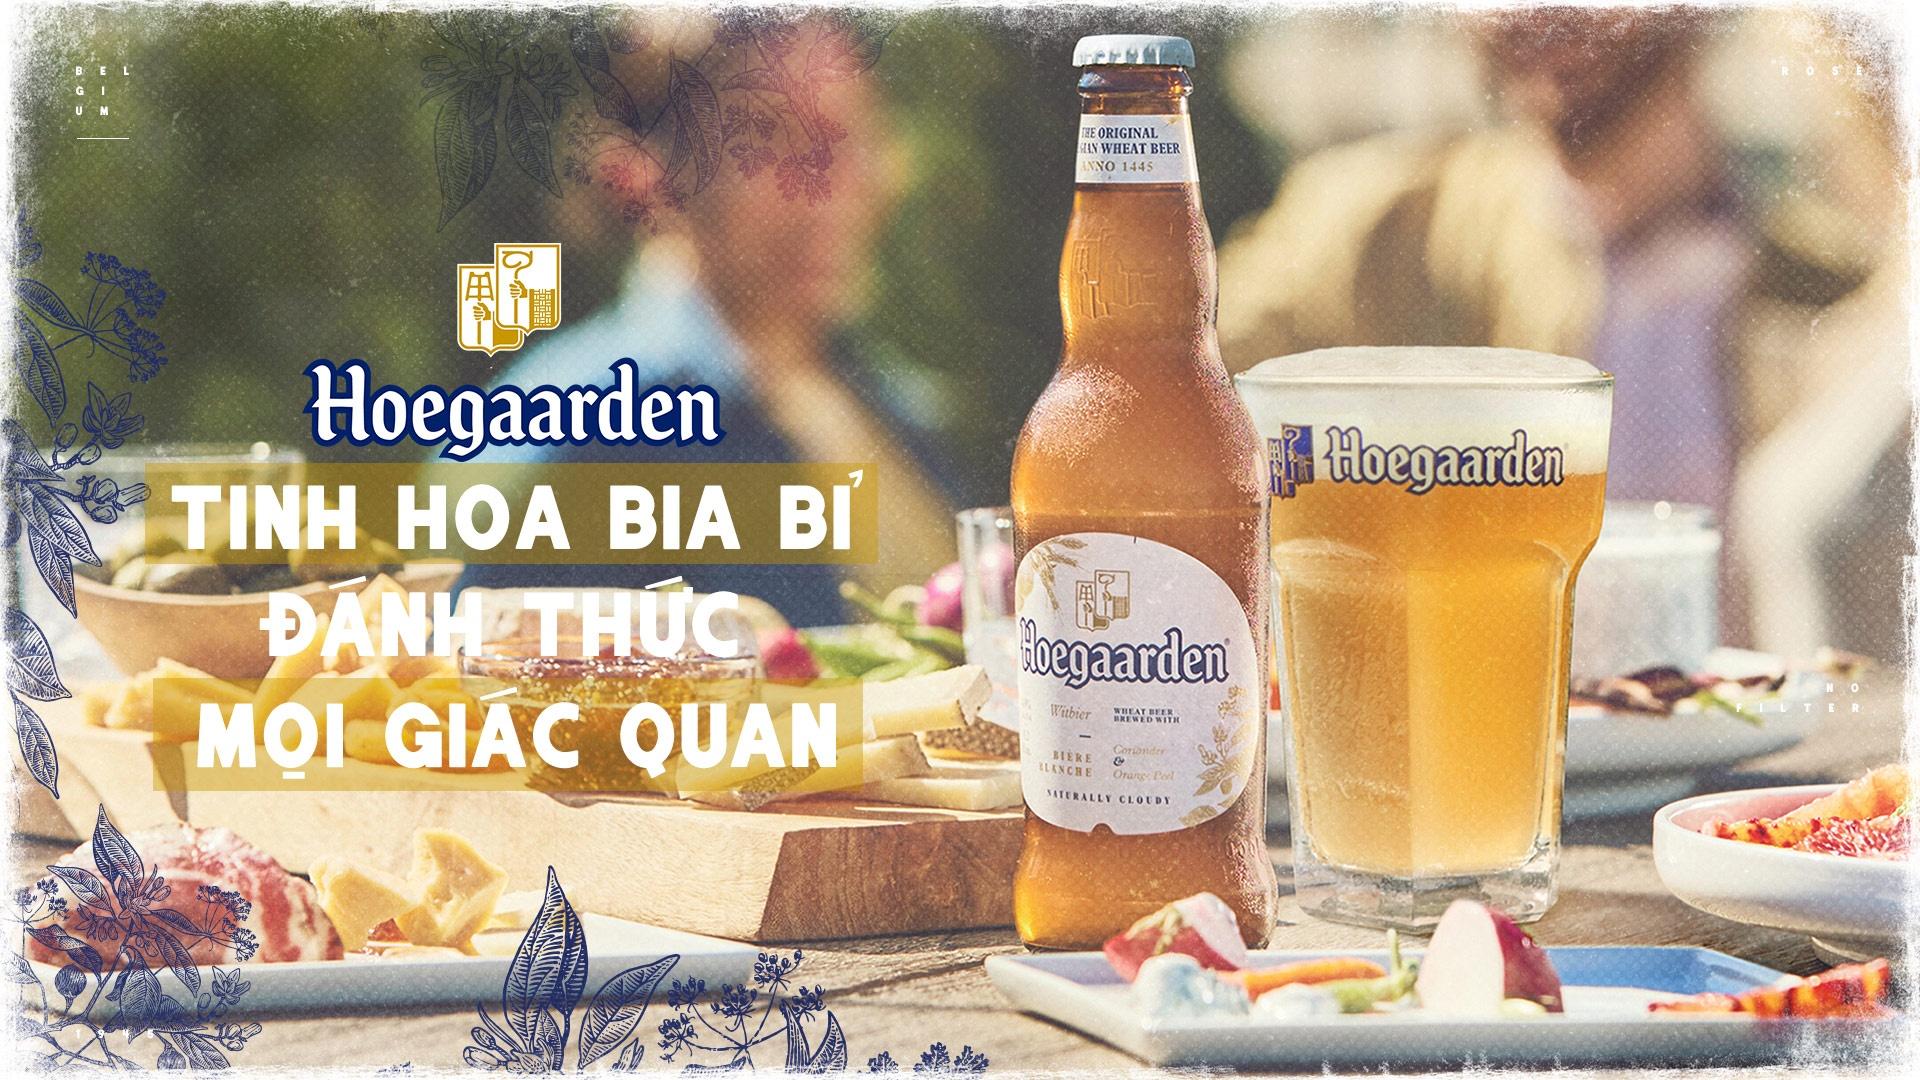 Hoegaarden - tinh hoa bia Bi danh thuc moi giac quan hinh anh 2